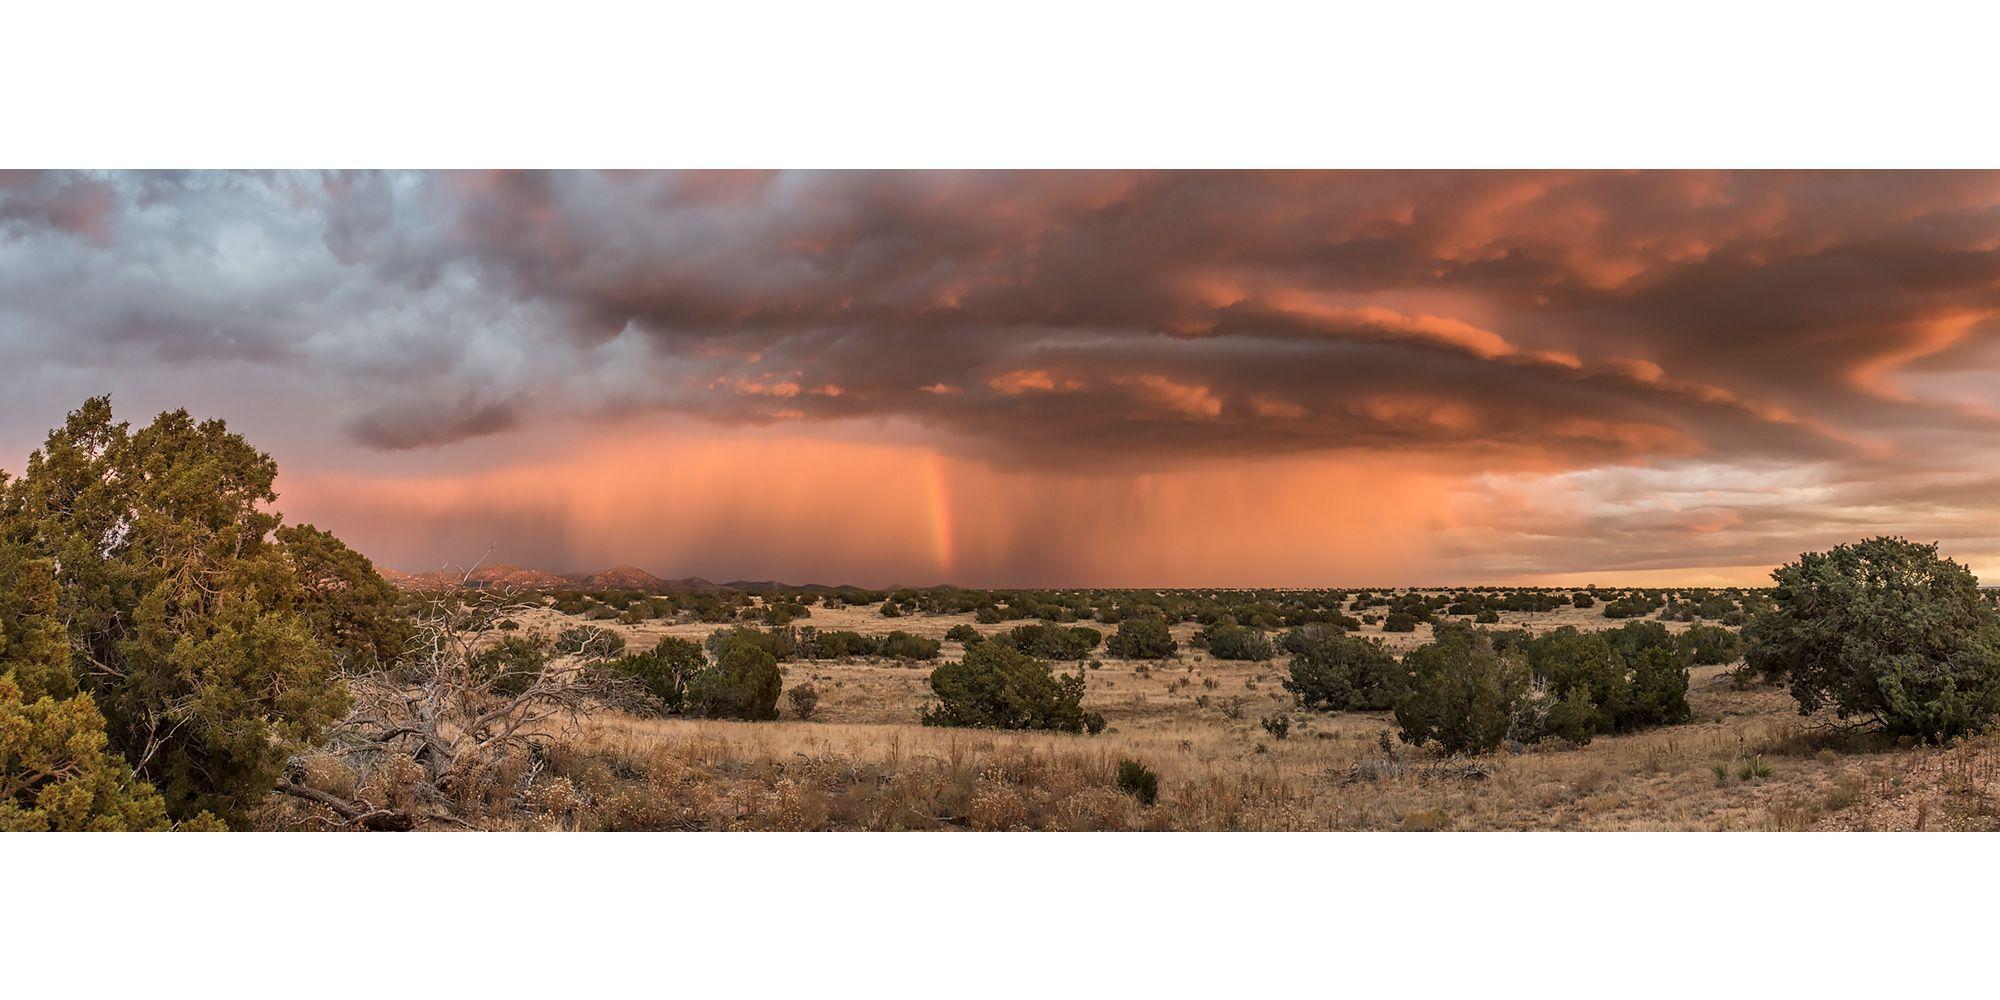 NM_MonsoonStorm.jpg